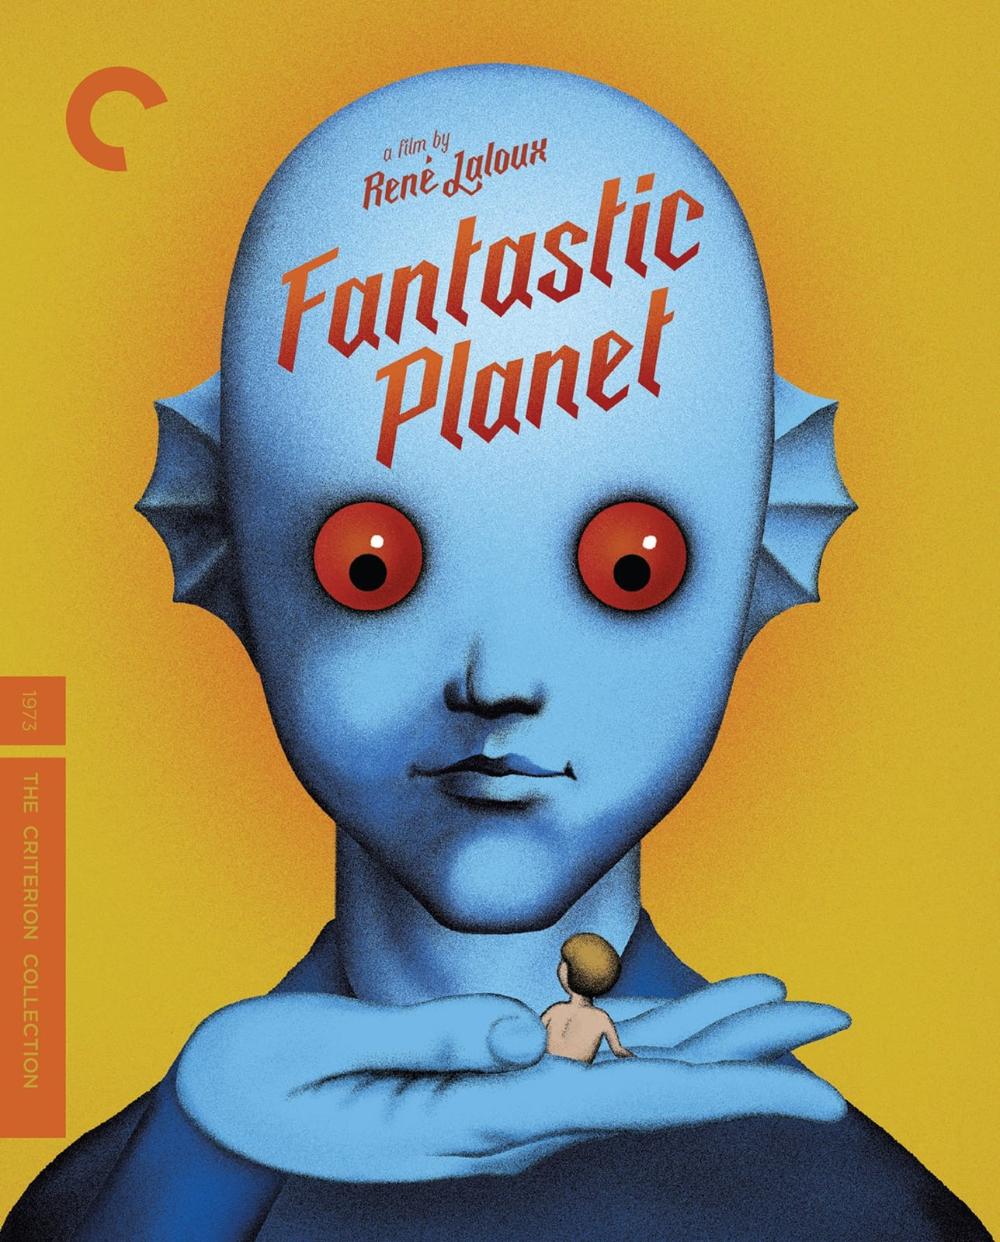 Fantastic Planet Stream